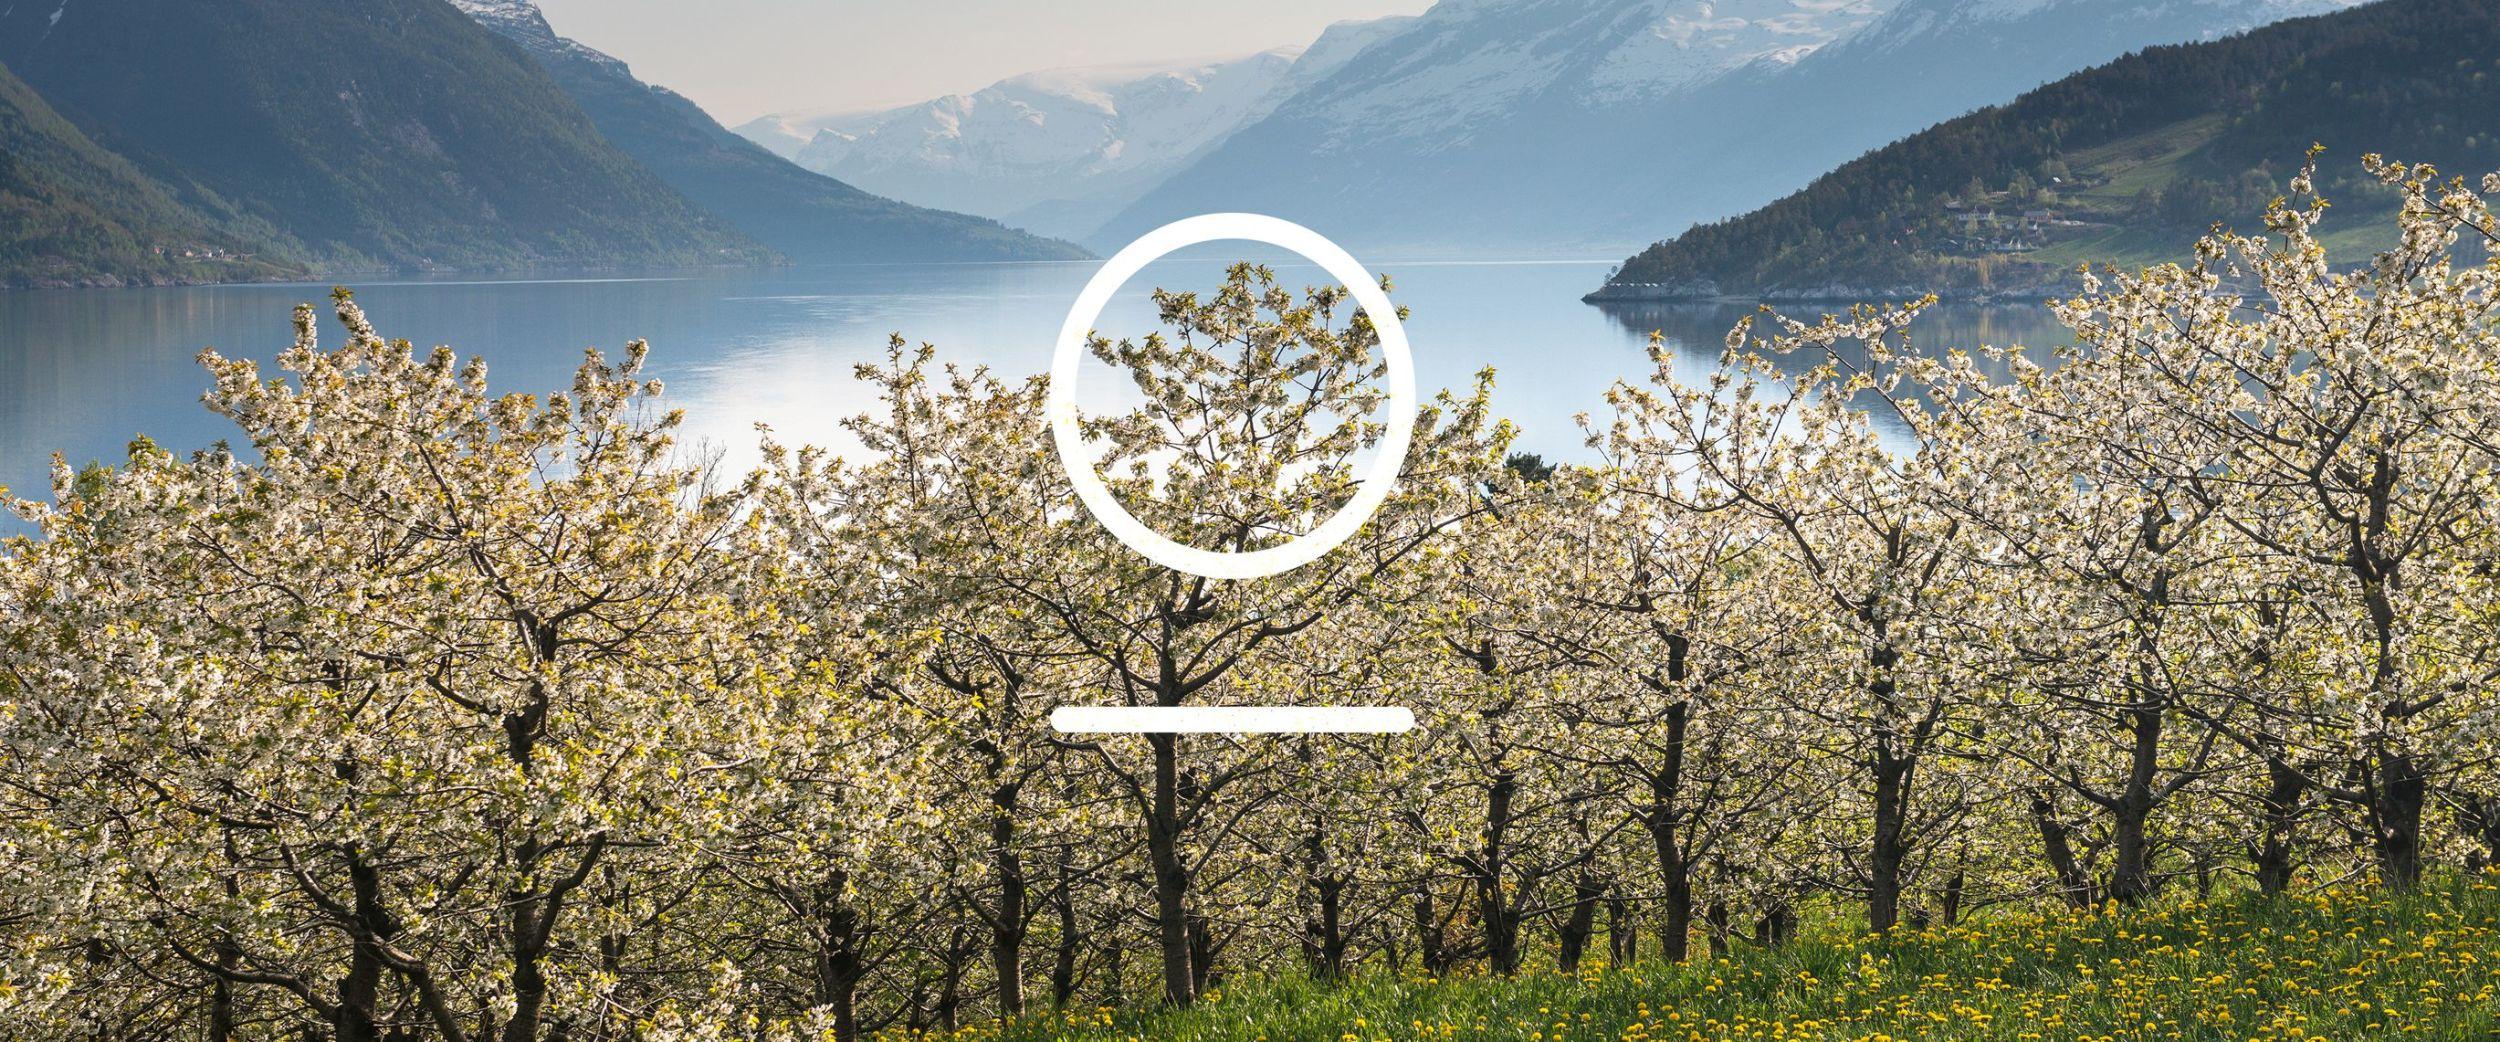 Apple blossoms in the Hardanger fjord. Photo: Sverre Hjørnevik, FjordNorway.no